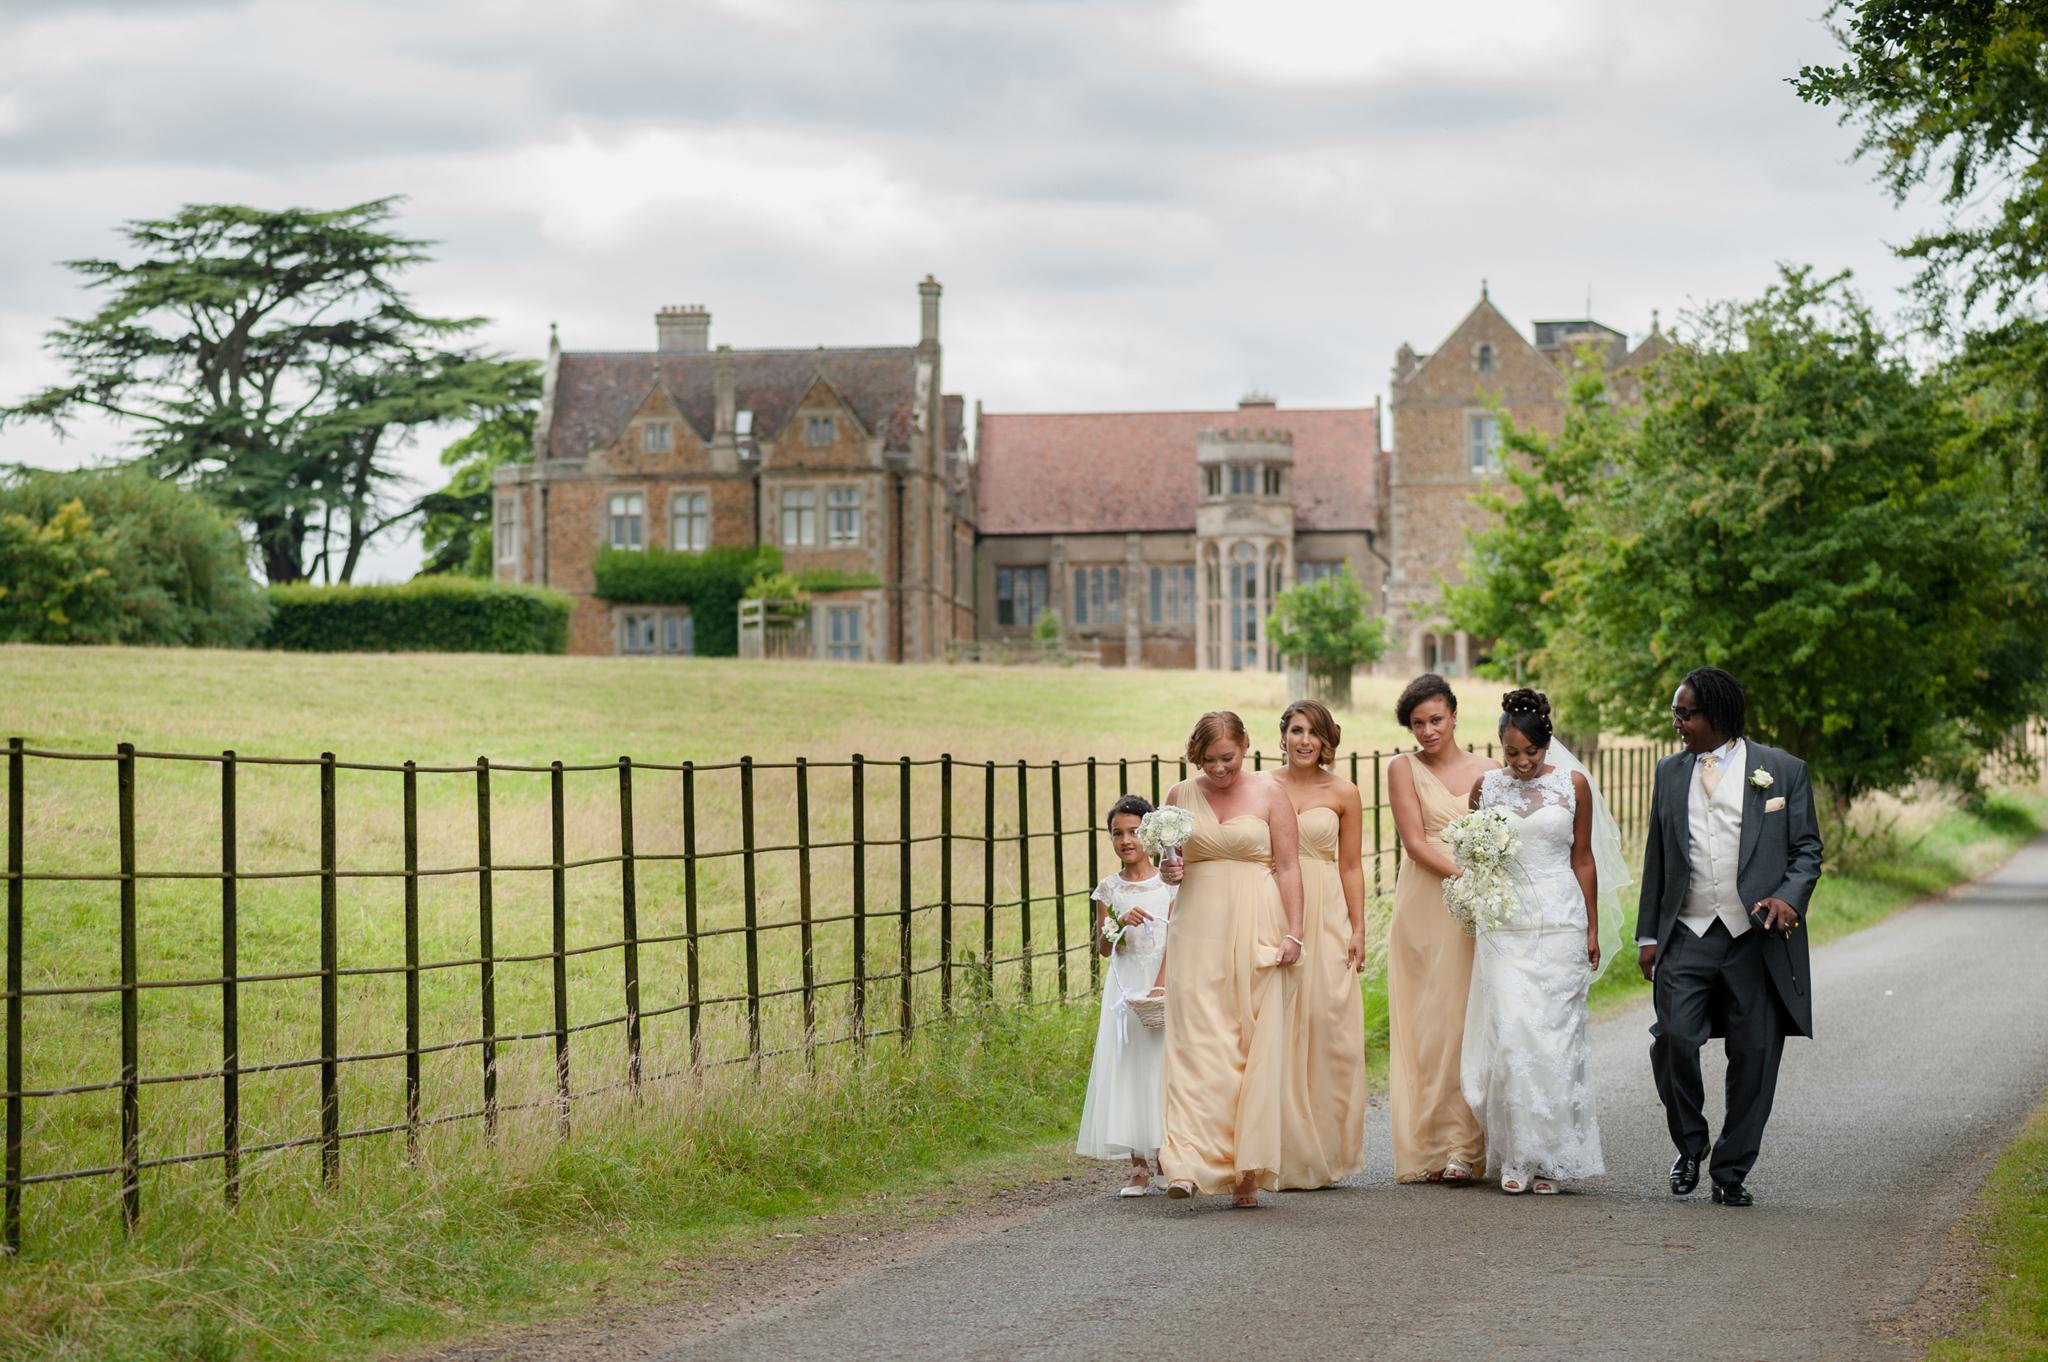 Bridal party walking to Fwsley Hall church 1001